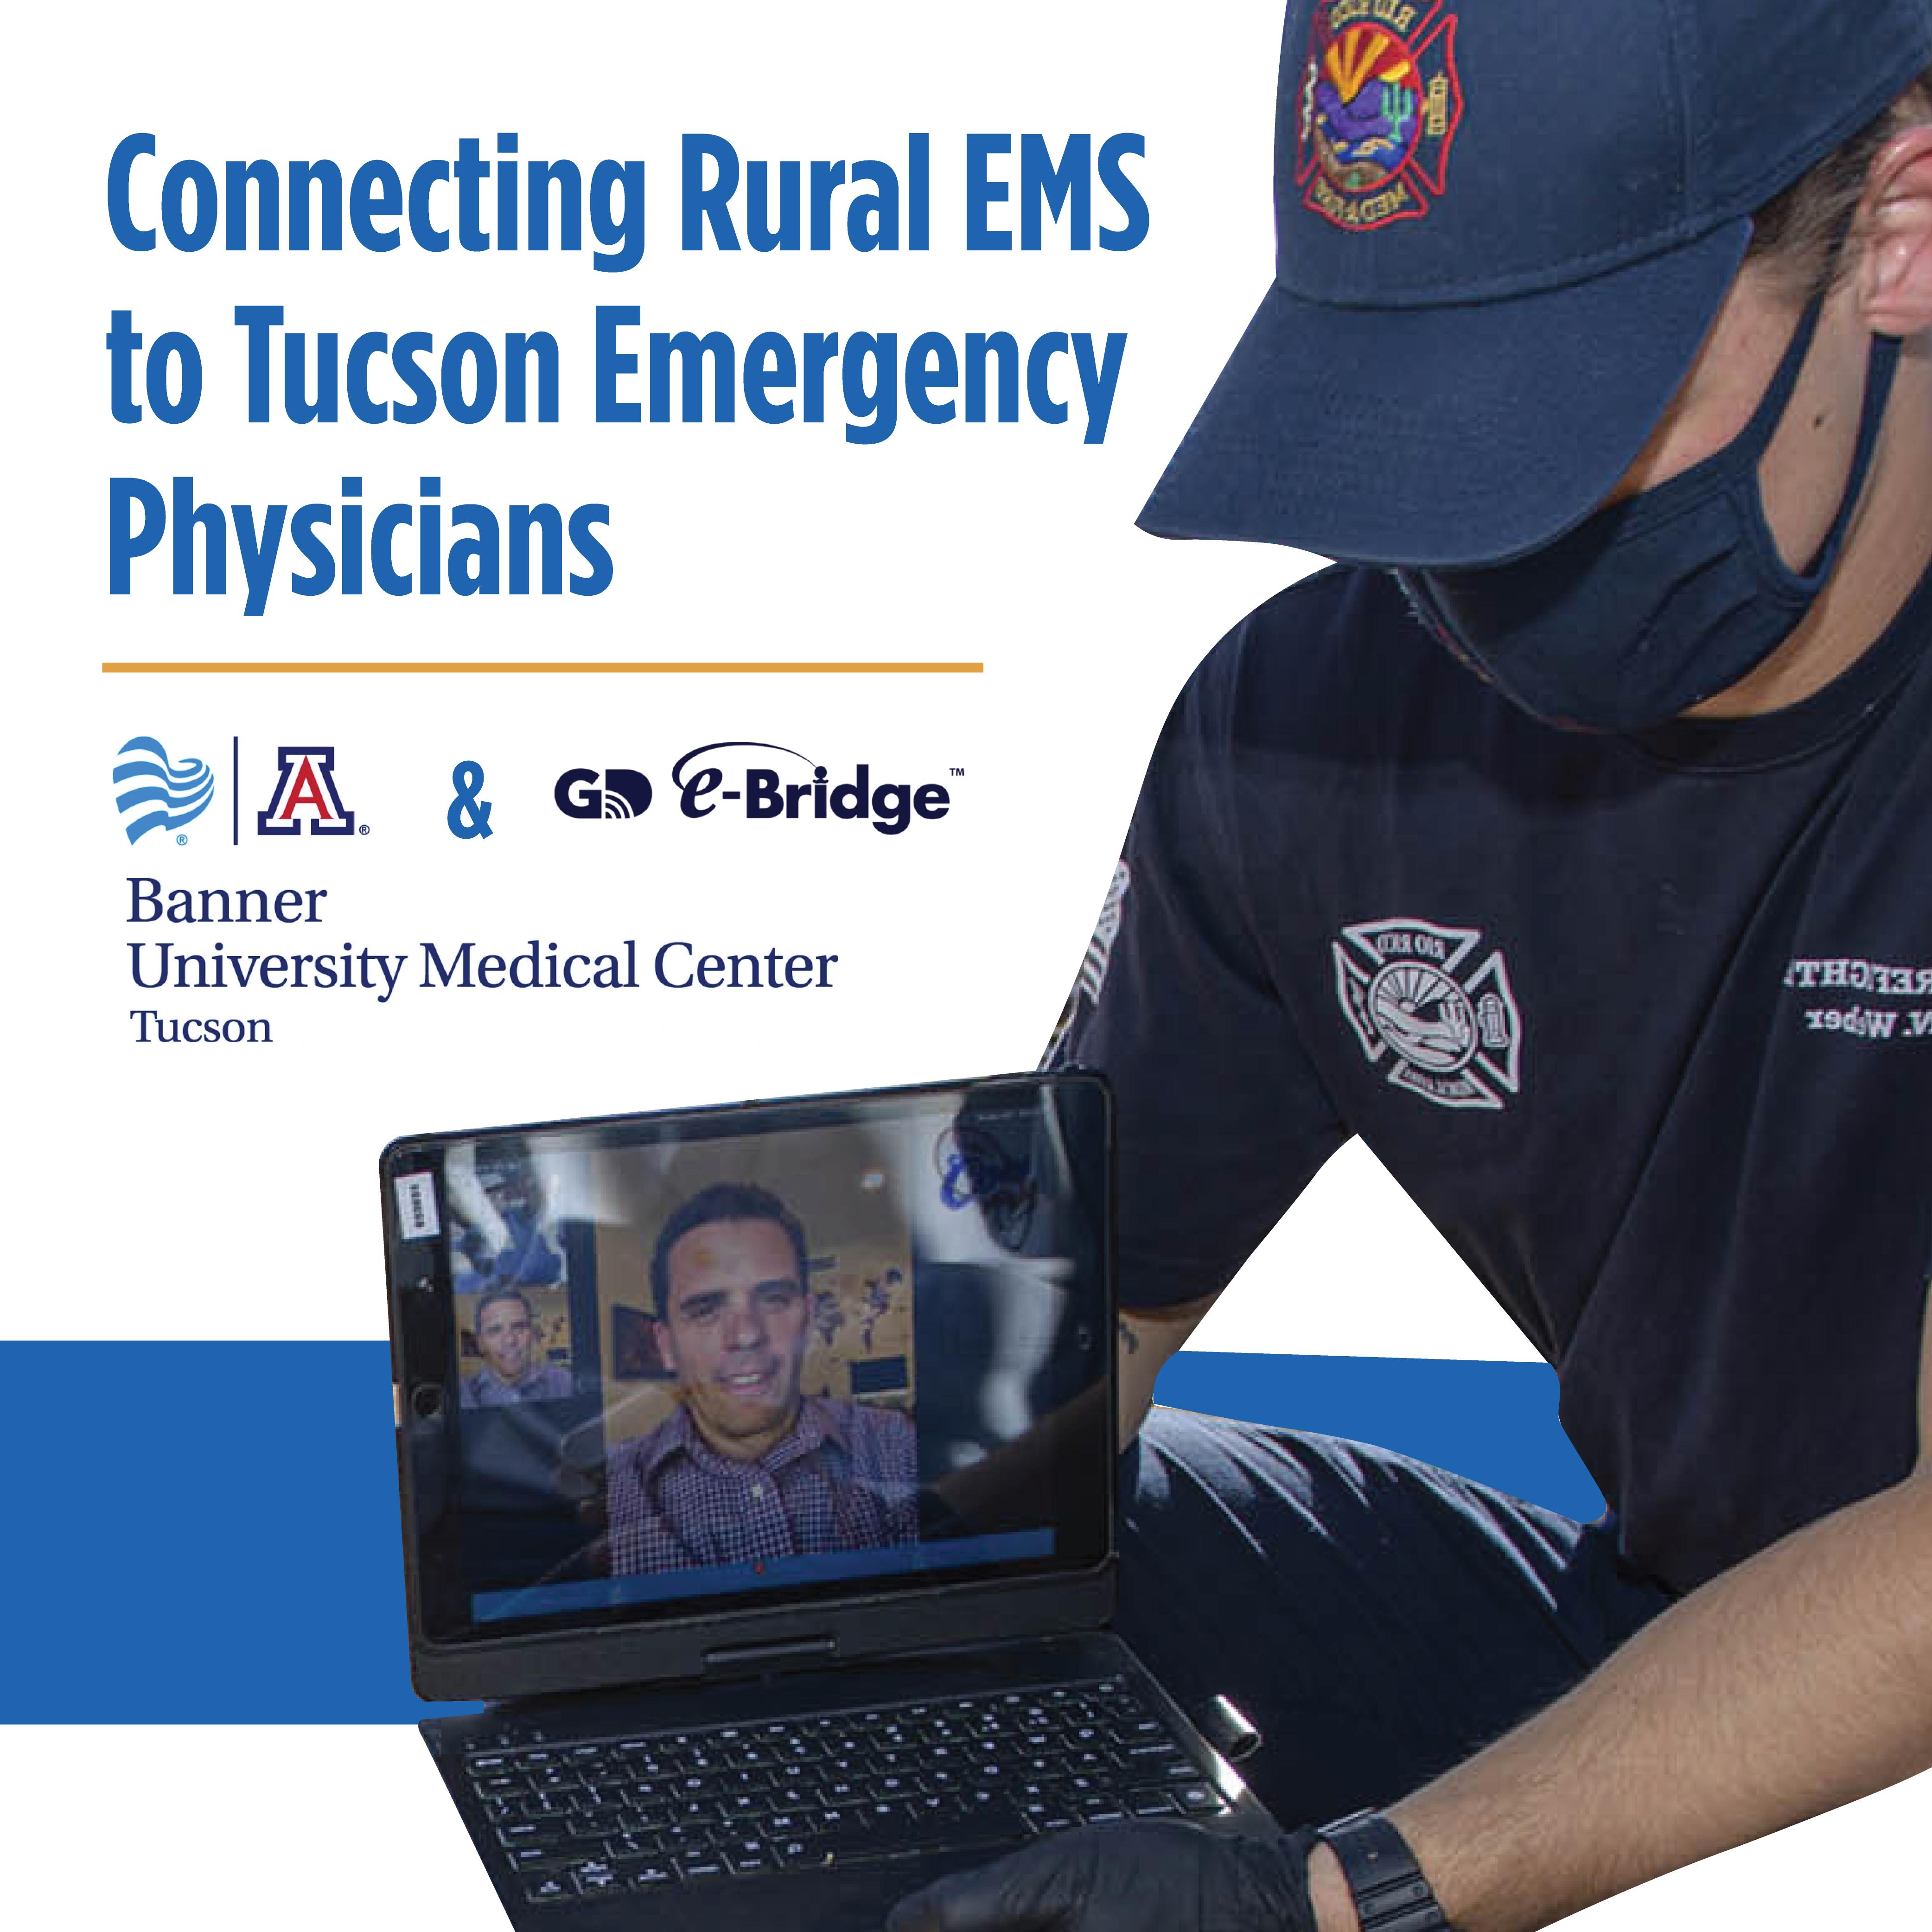 Tucson Rural EMS